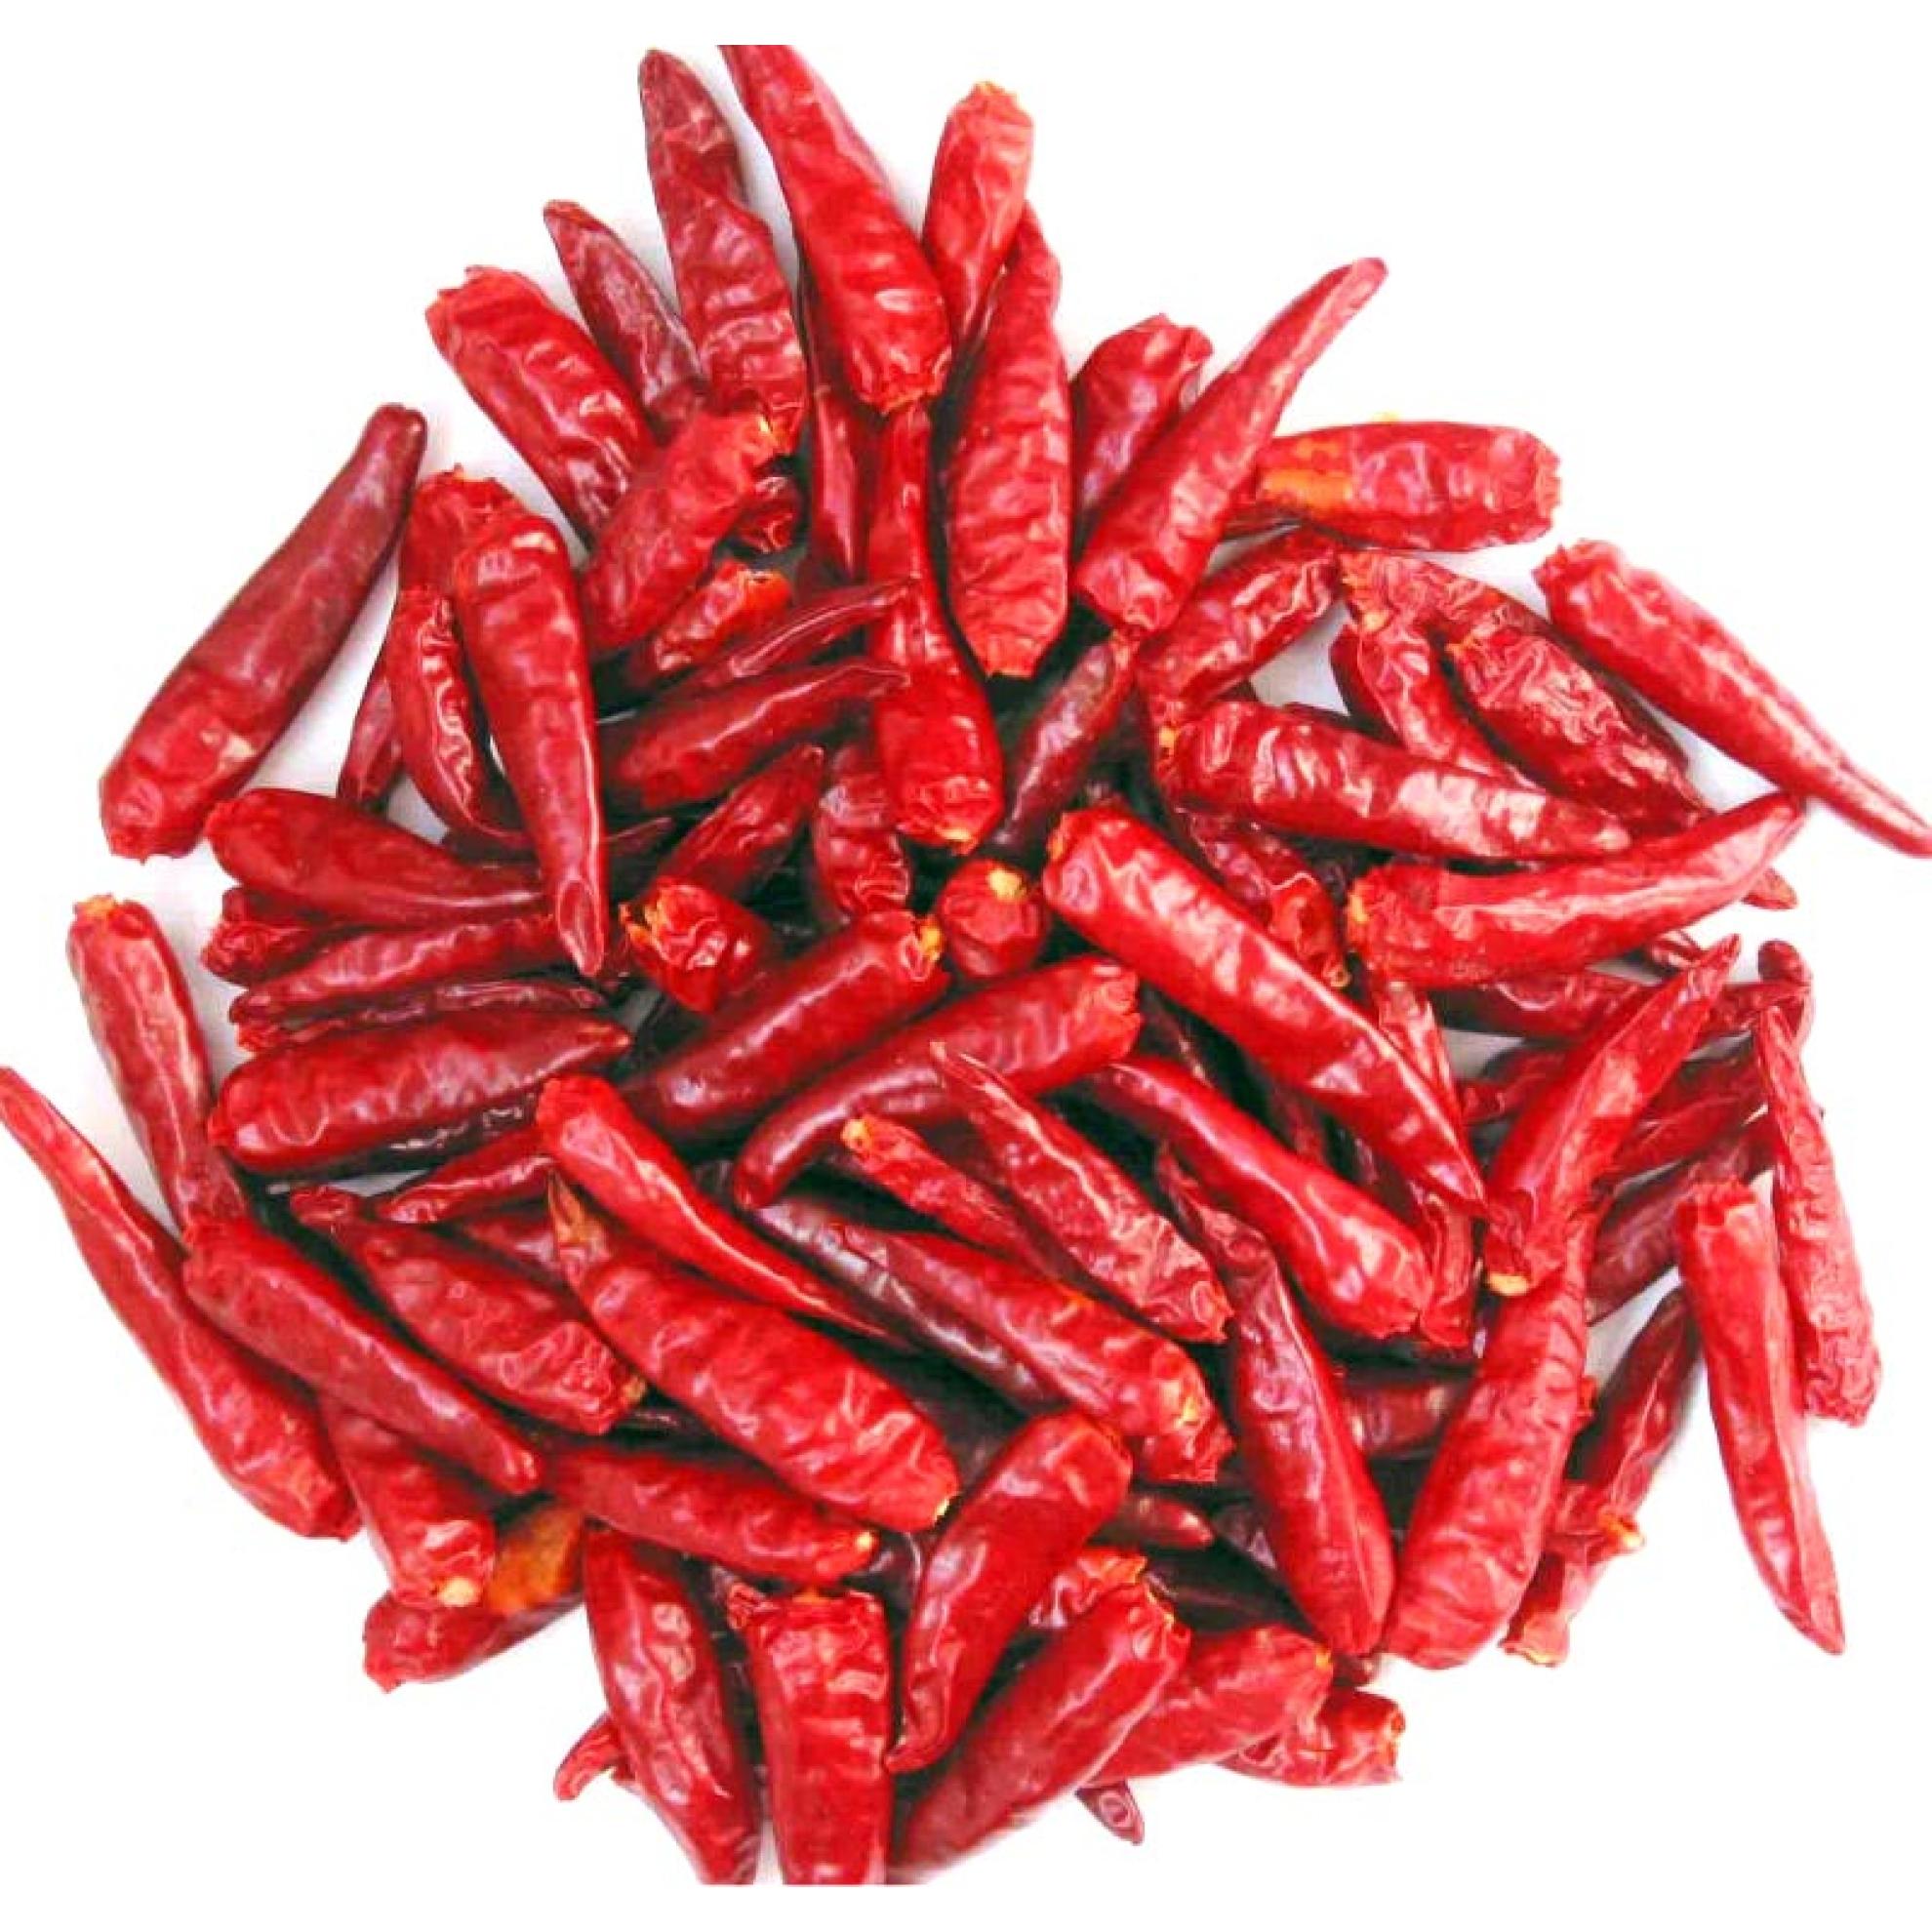 dry whole red chillies stemless getrocknete. Black Bedroom Furniture Sets. Home Design Ideas